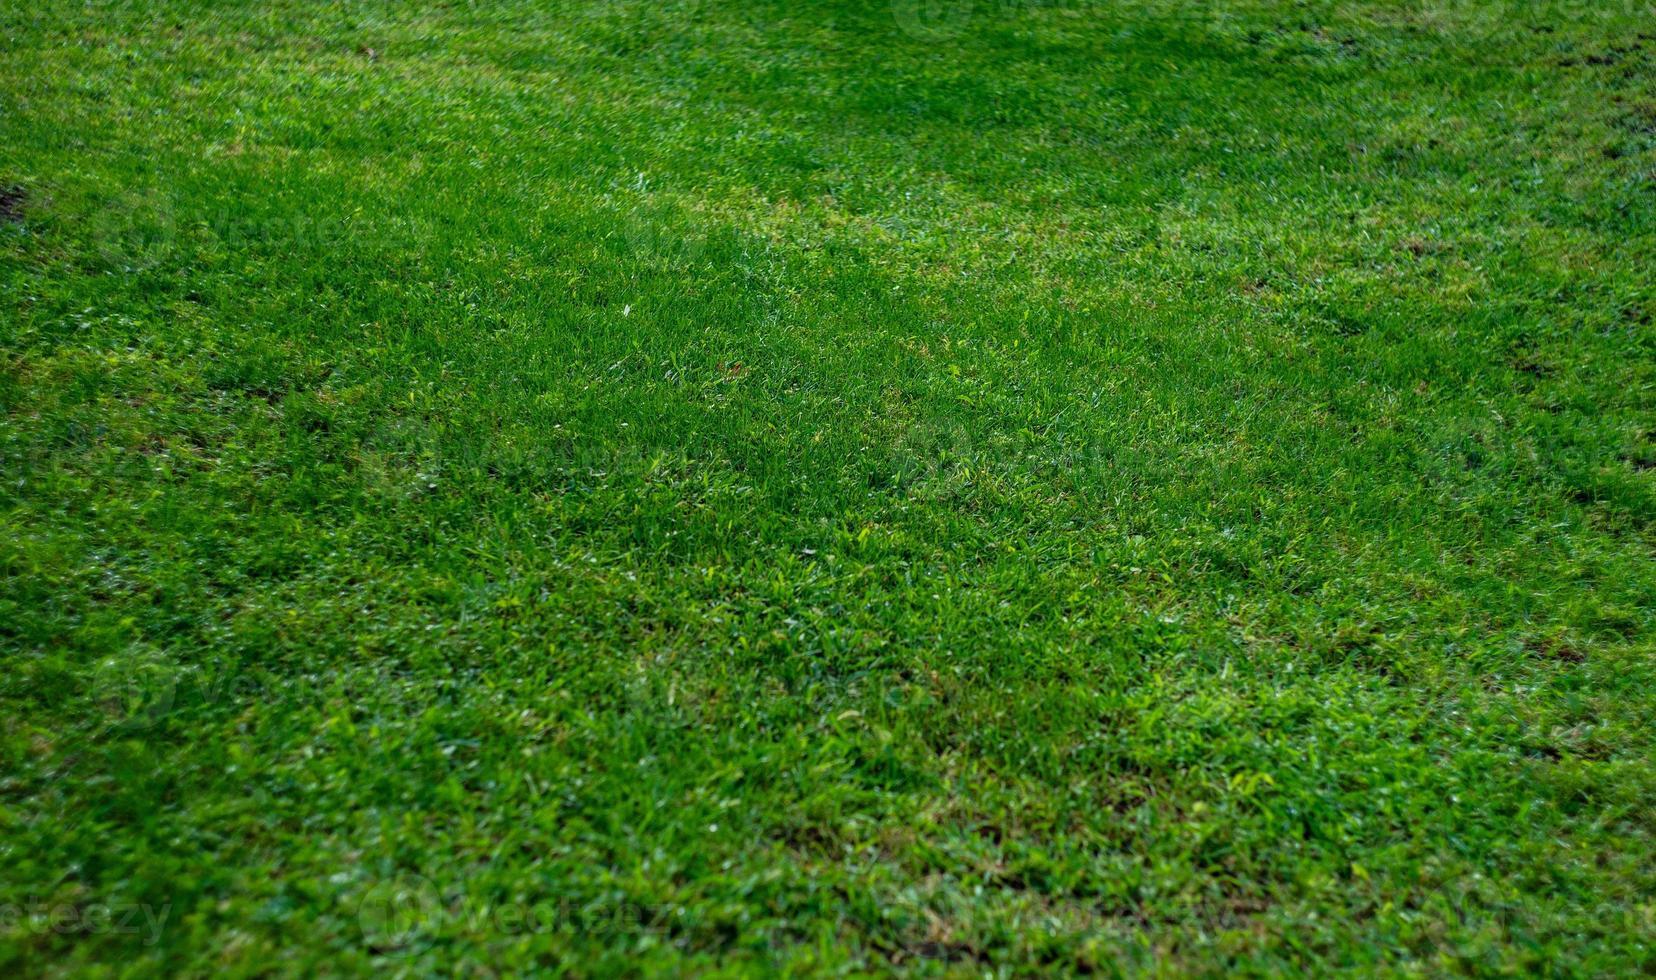 zomer achtergrond met groen gras foto